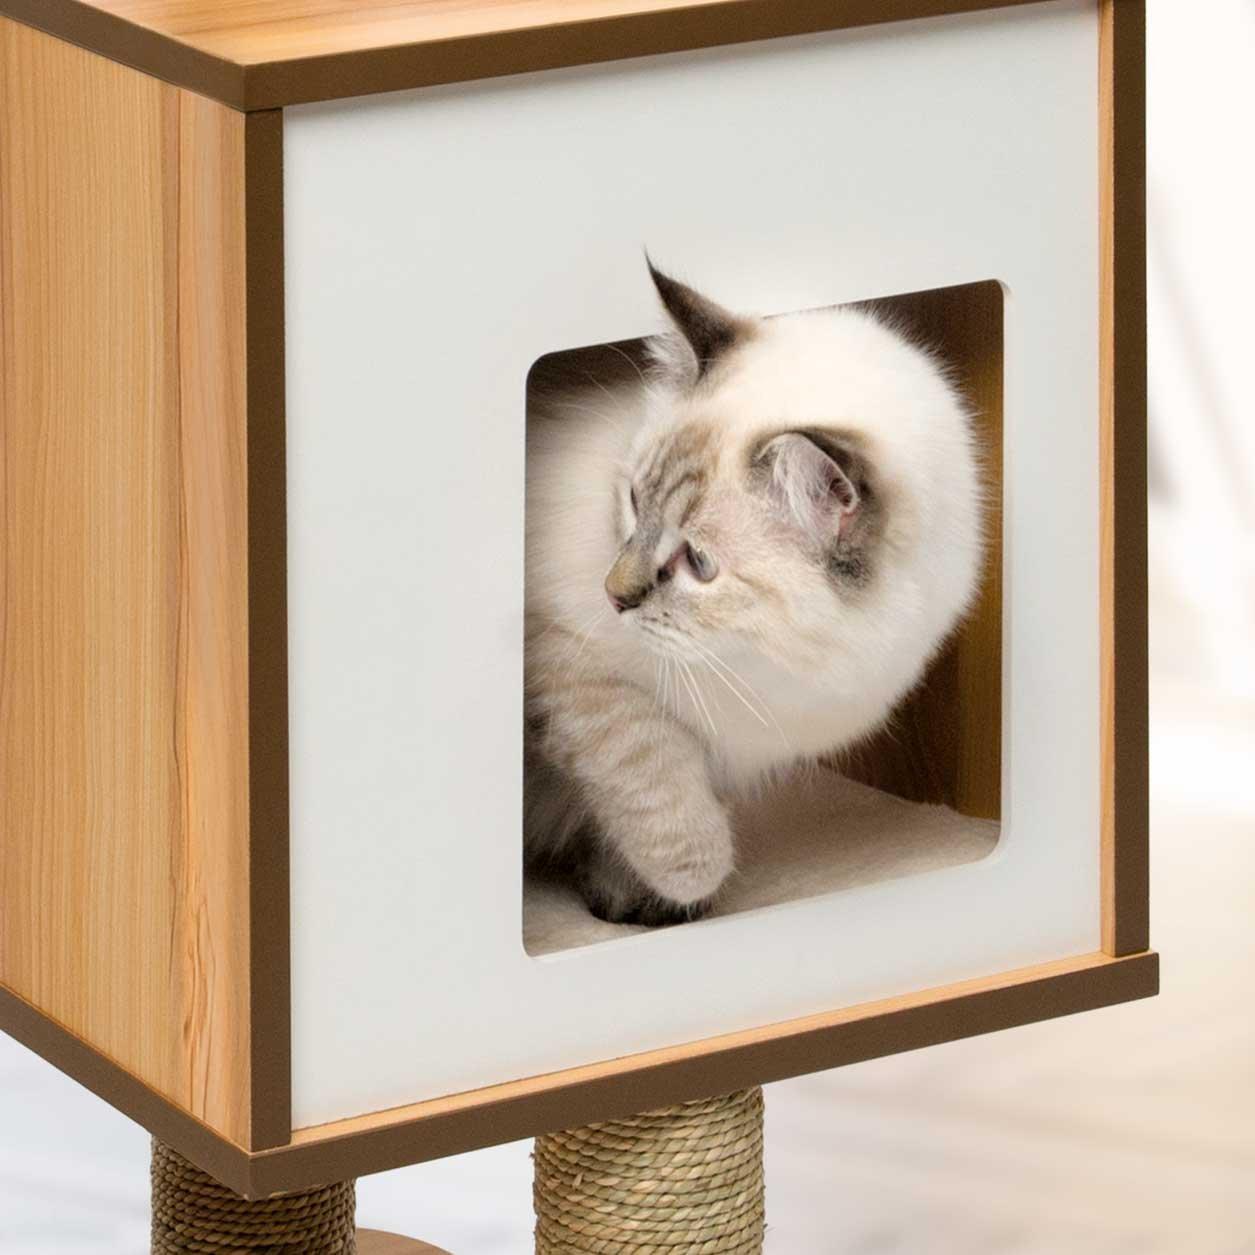 Amazoncom Vesper Cat Furniture Walnut VBase Pet Supplies - 22 cats living better life right now